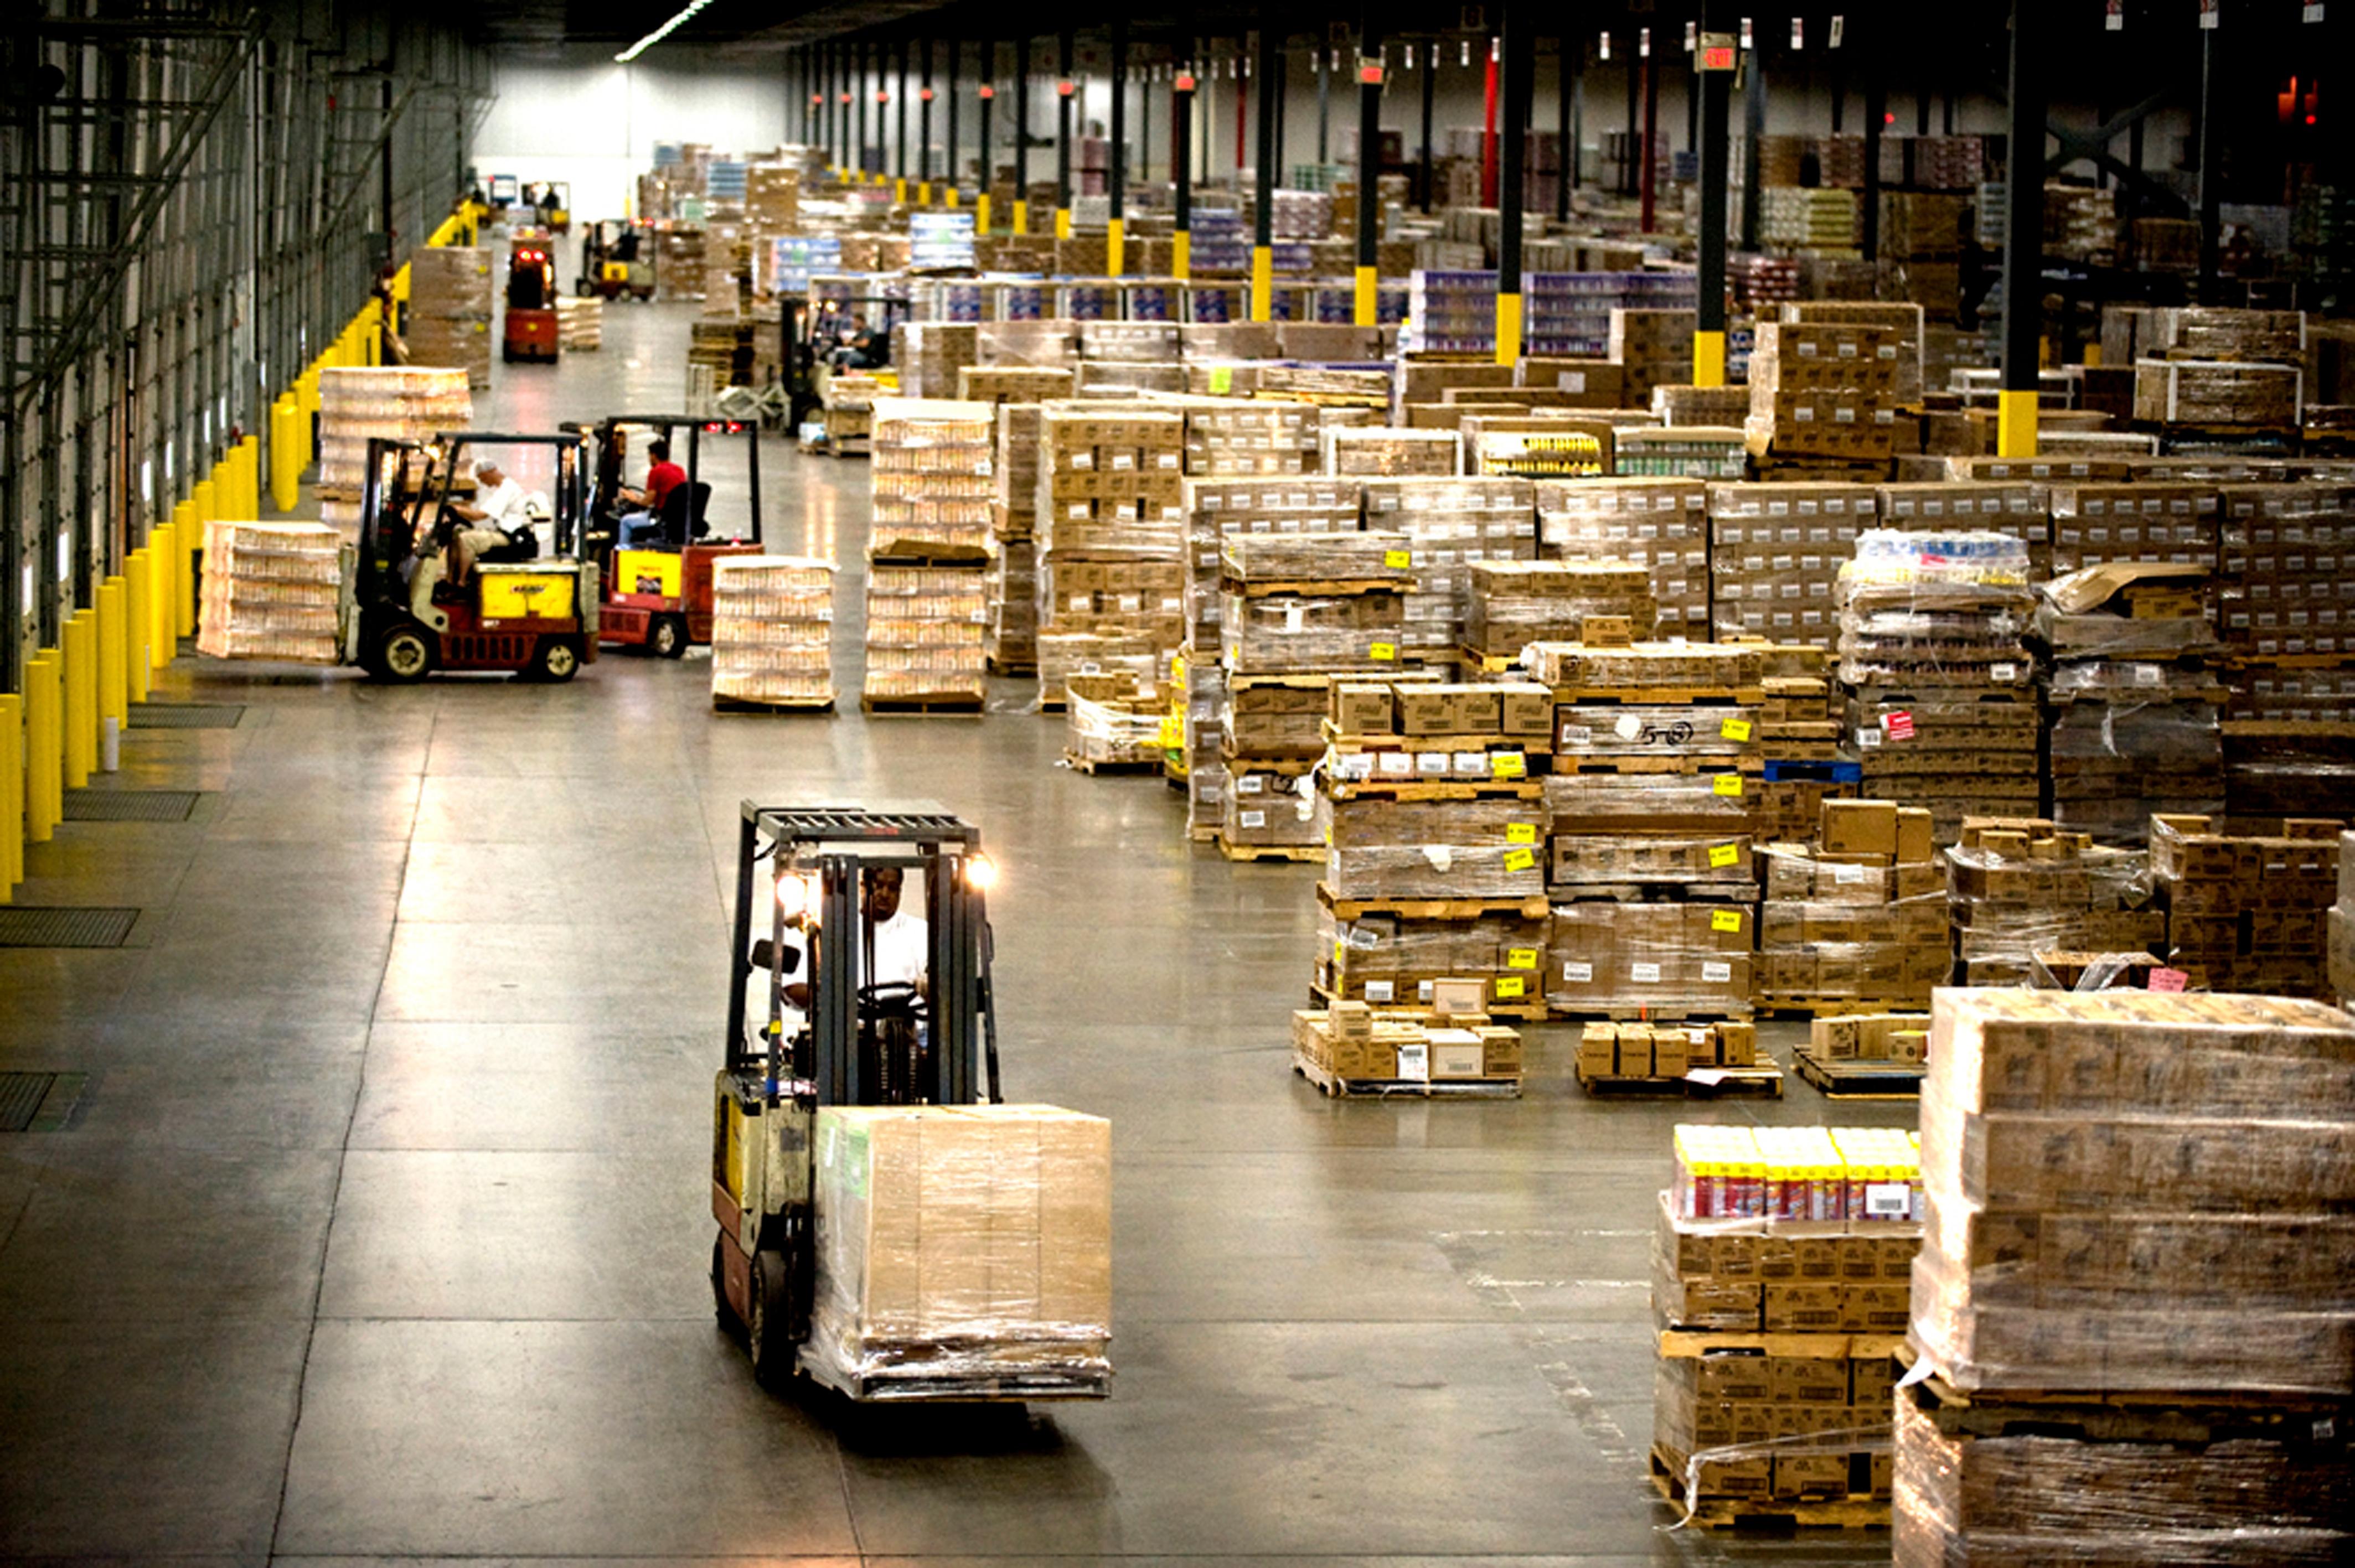 4 Warehouse & Logistics Improvement Ideas